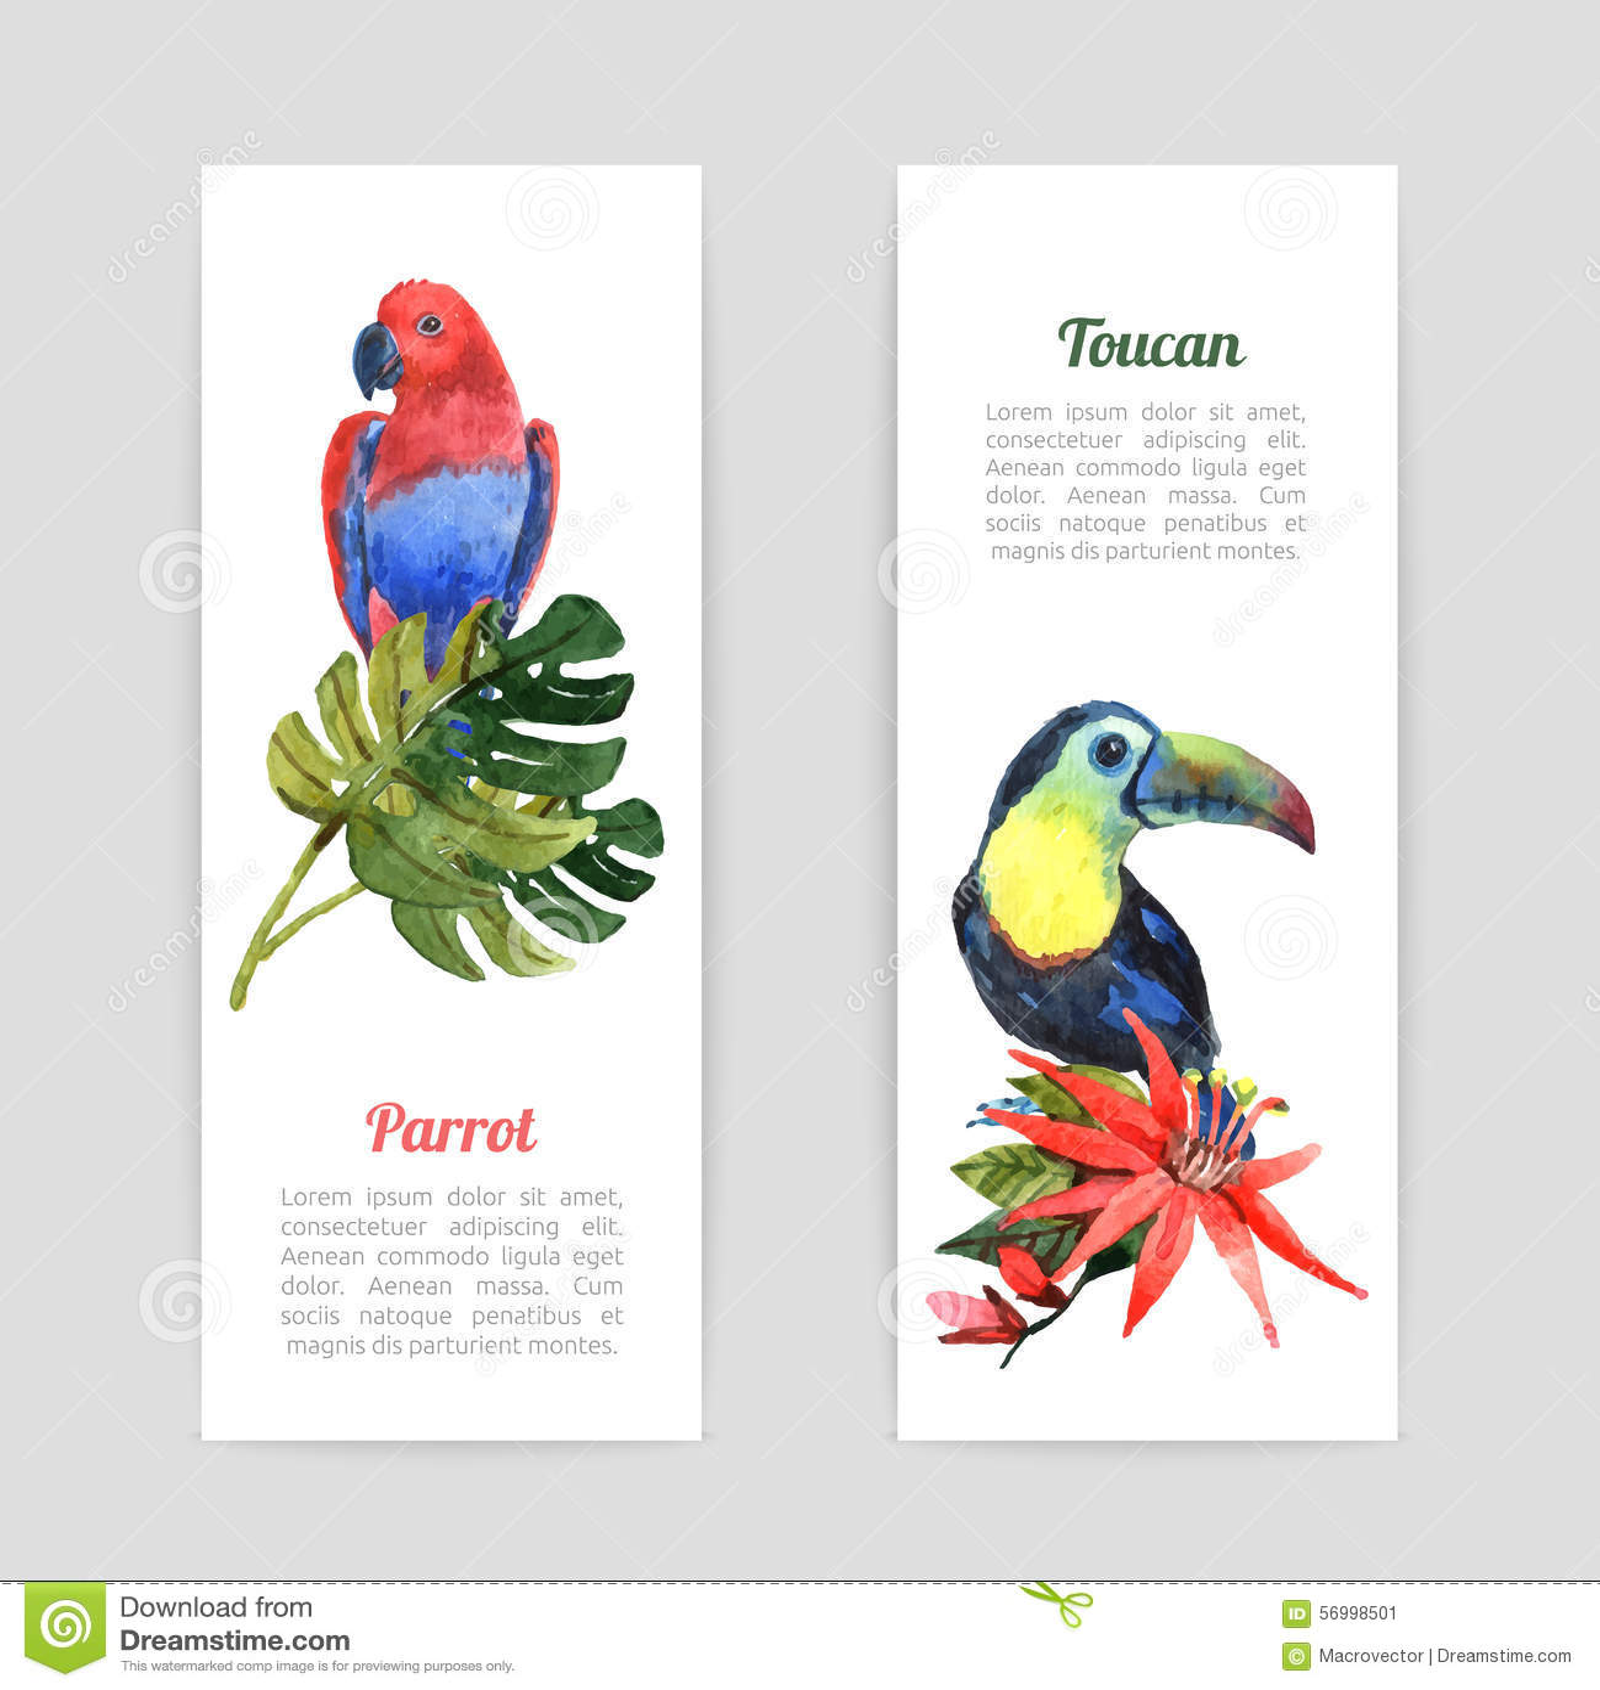 how to set up parrot healer